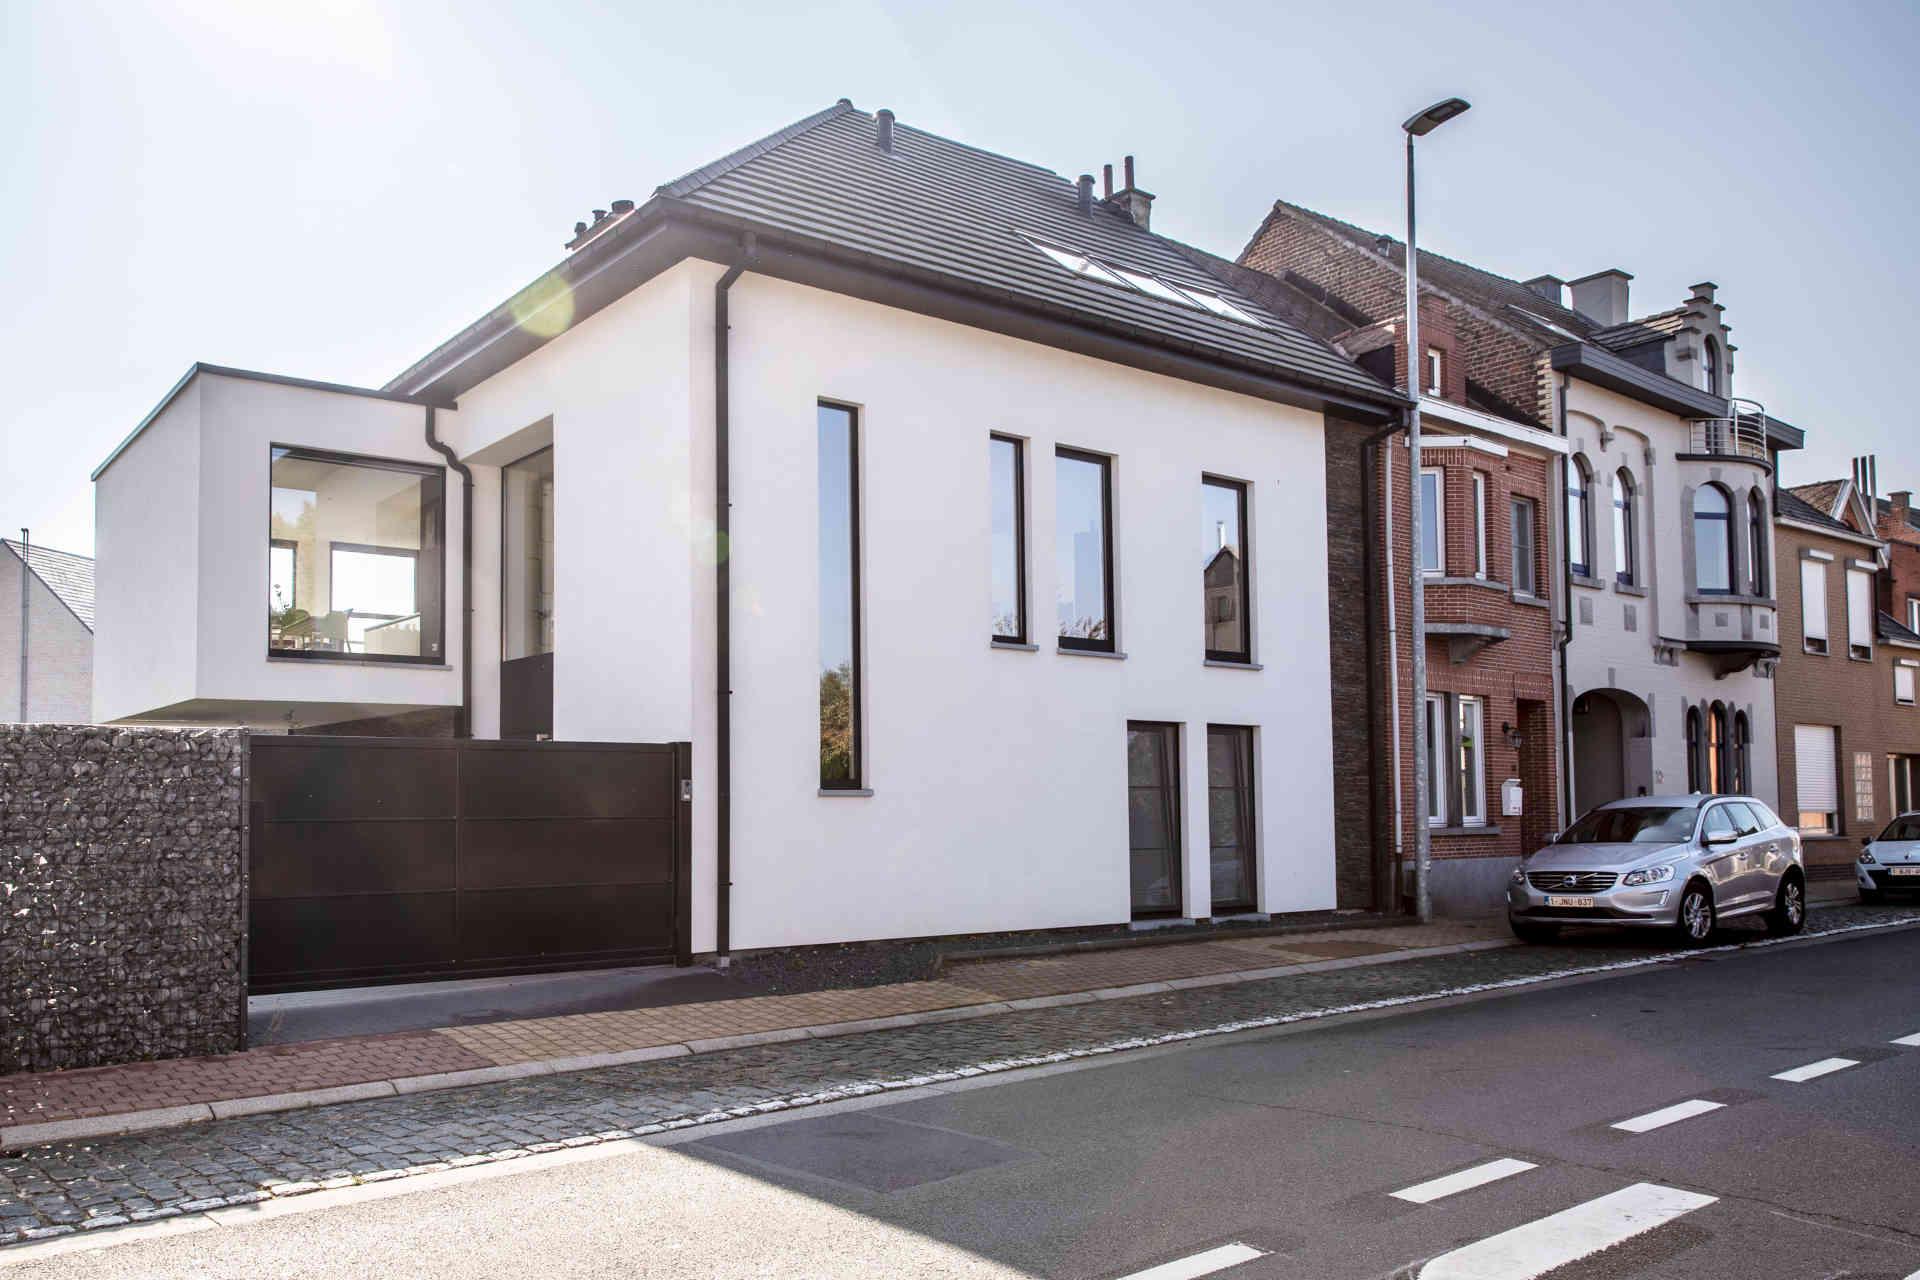 Iddergemstraat